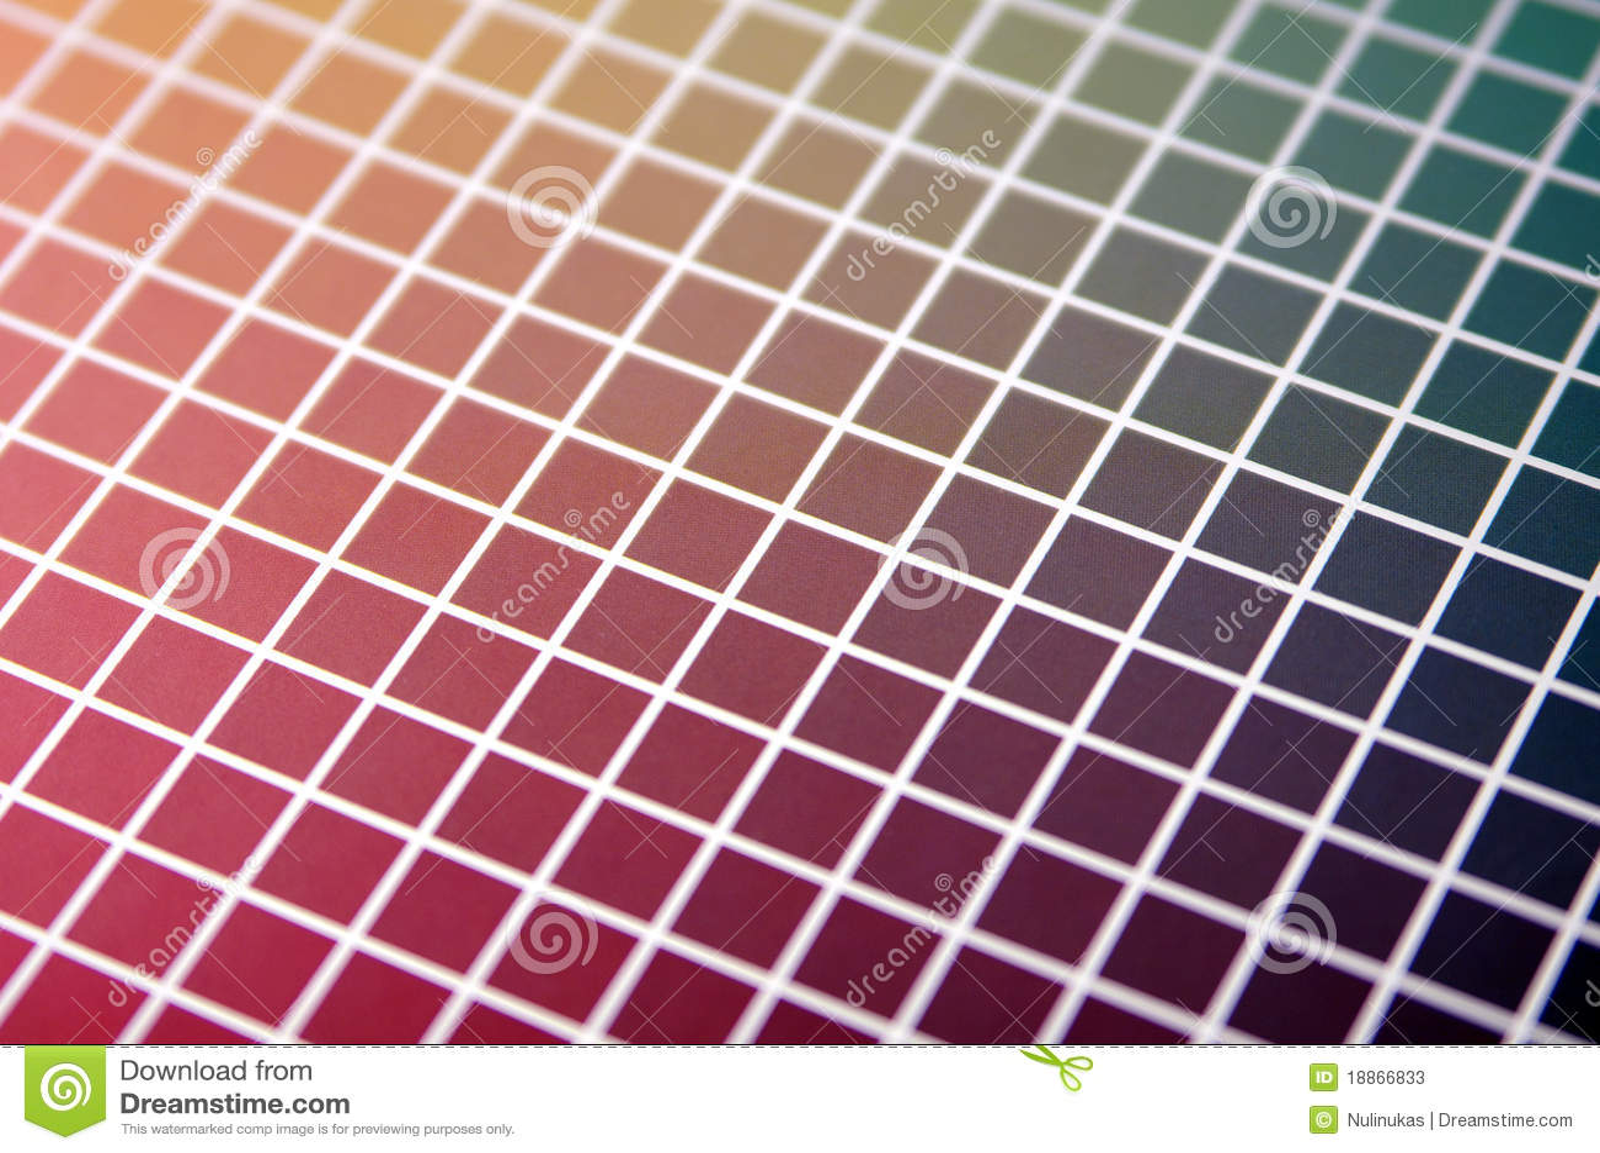 Color Palette Background Stock Photos - Image: 18866833